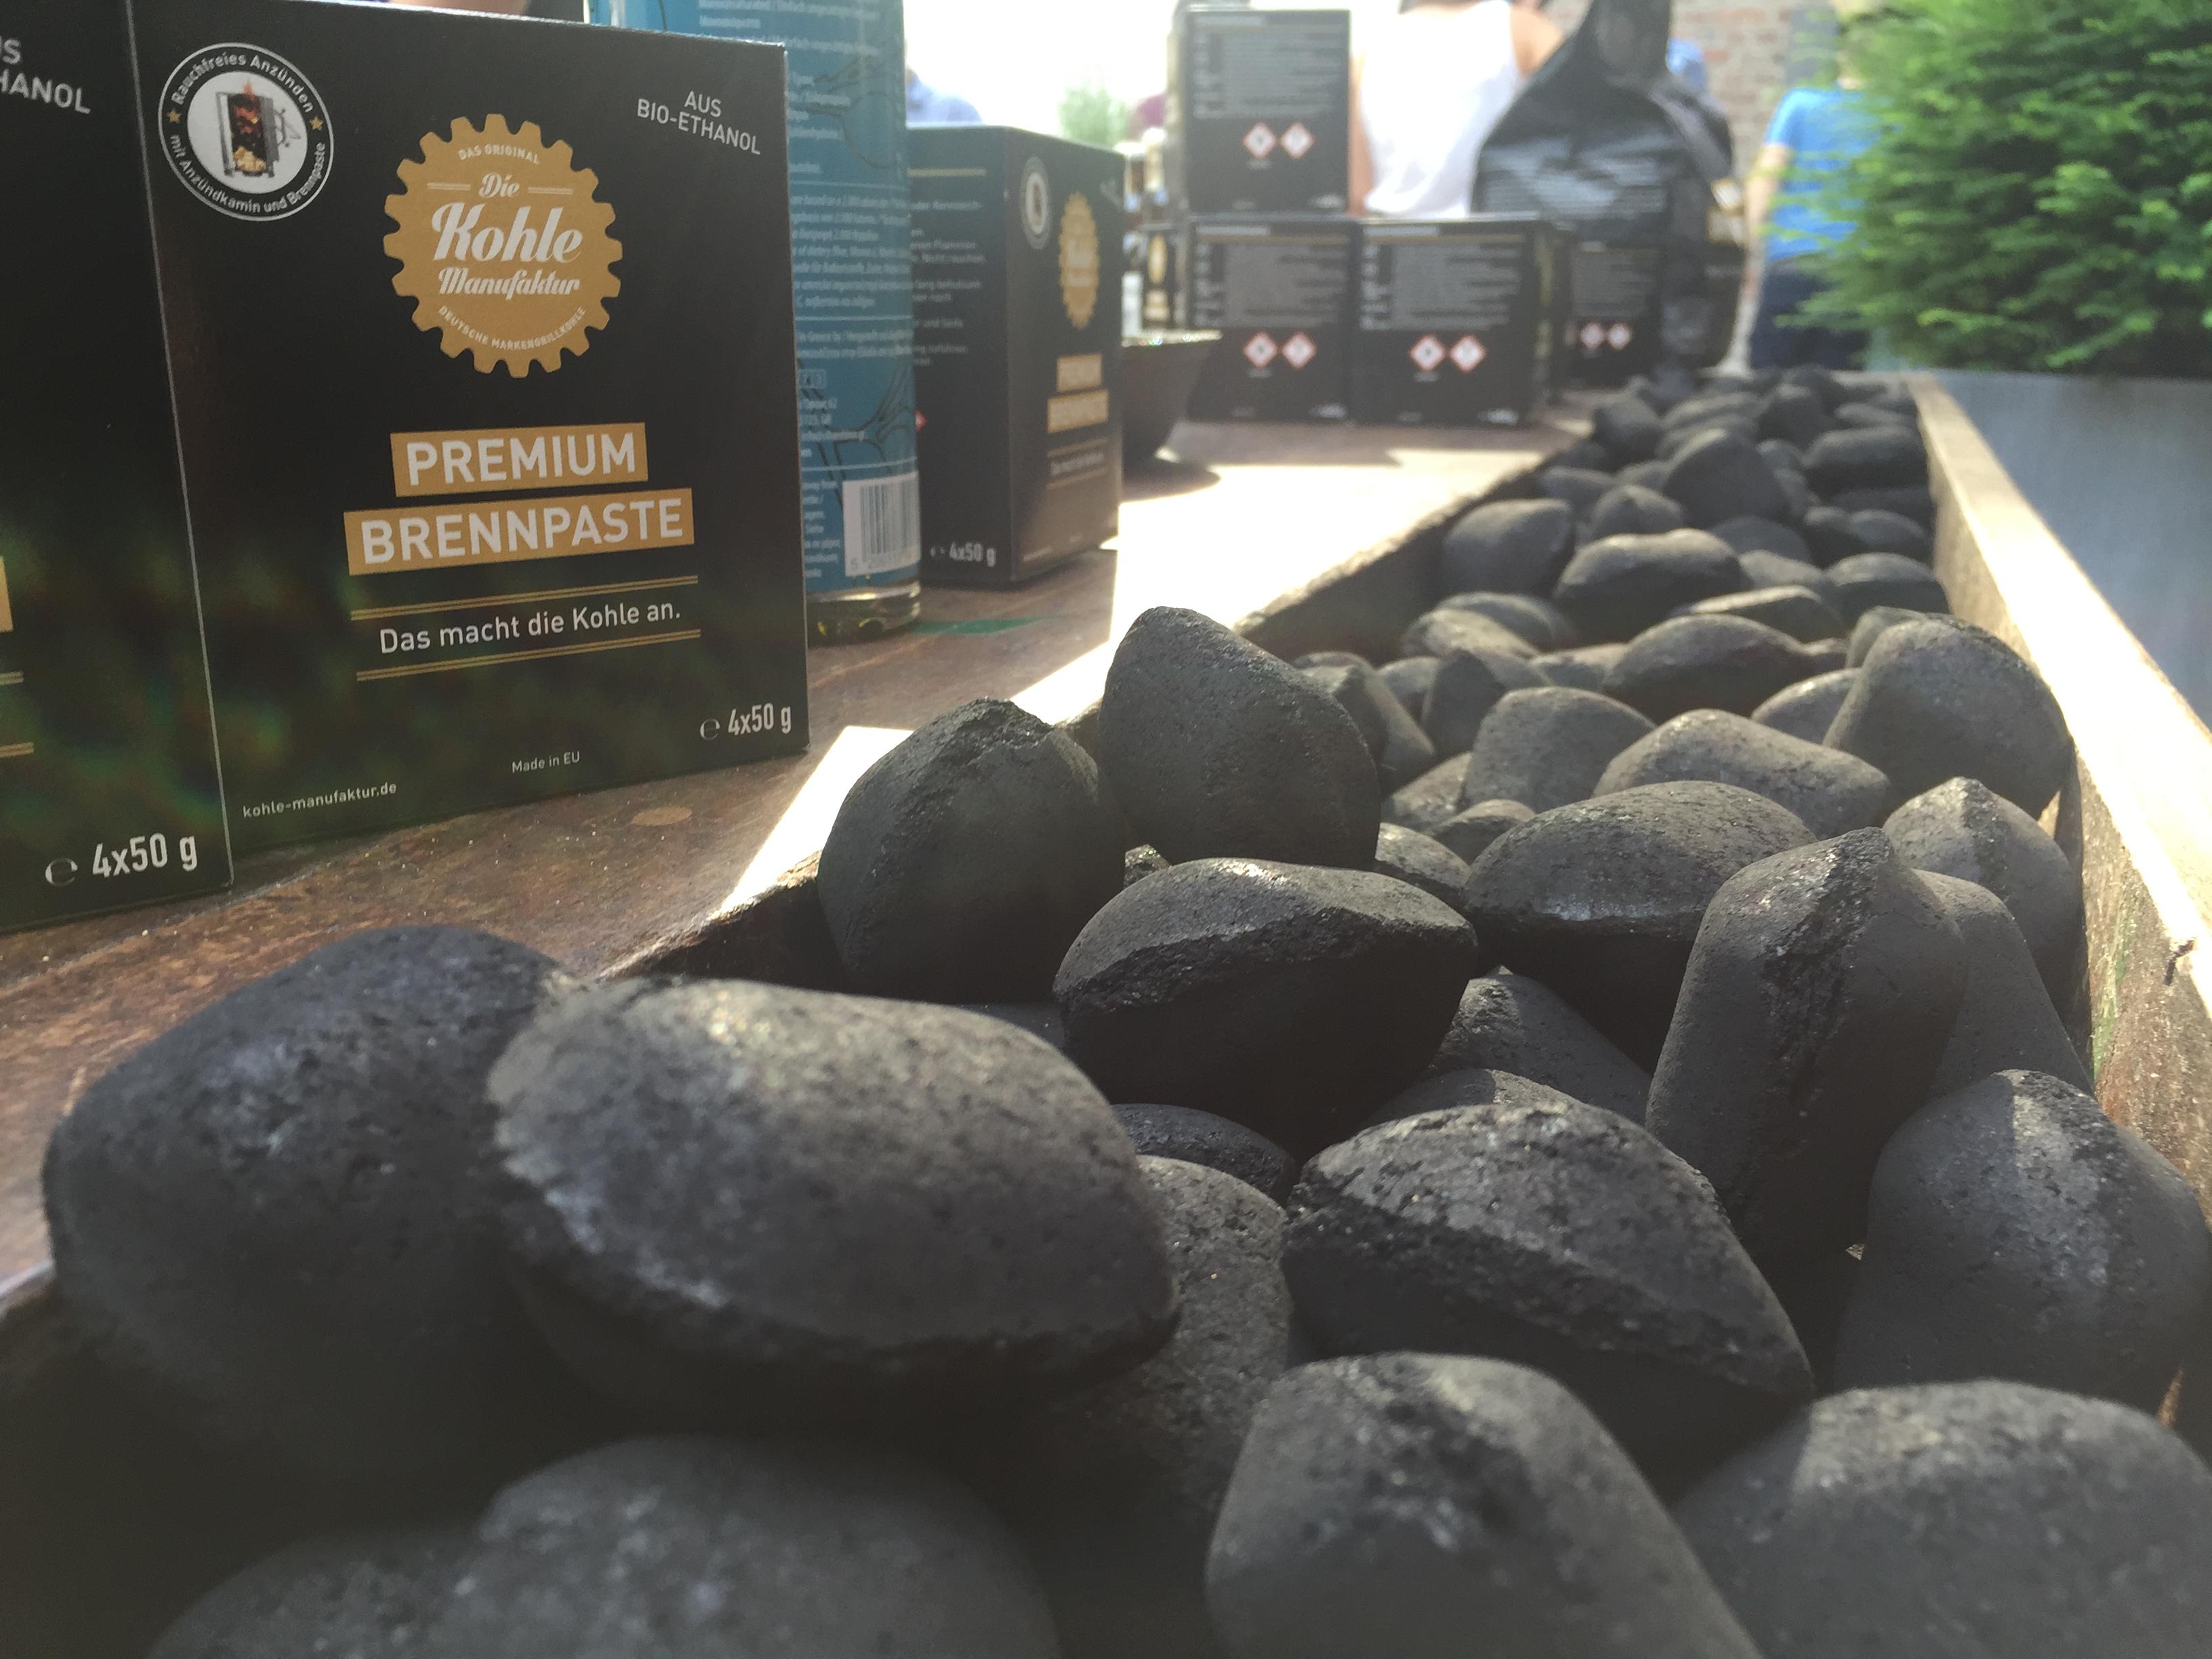 Die Kohle-Manufaktur